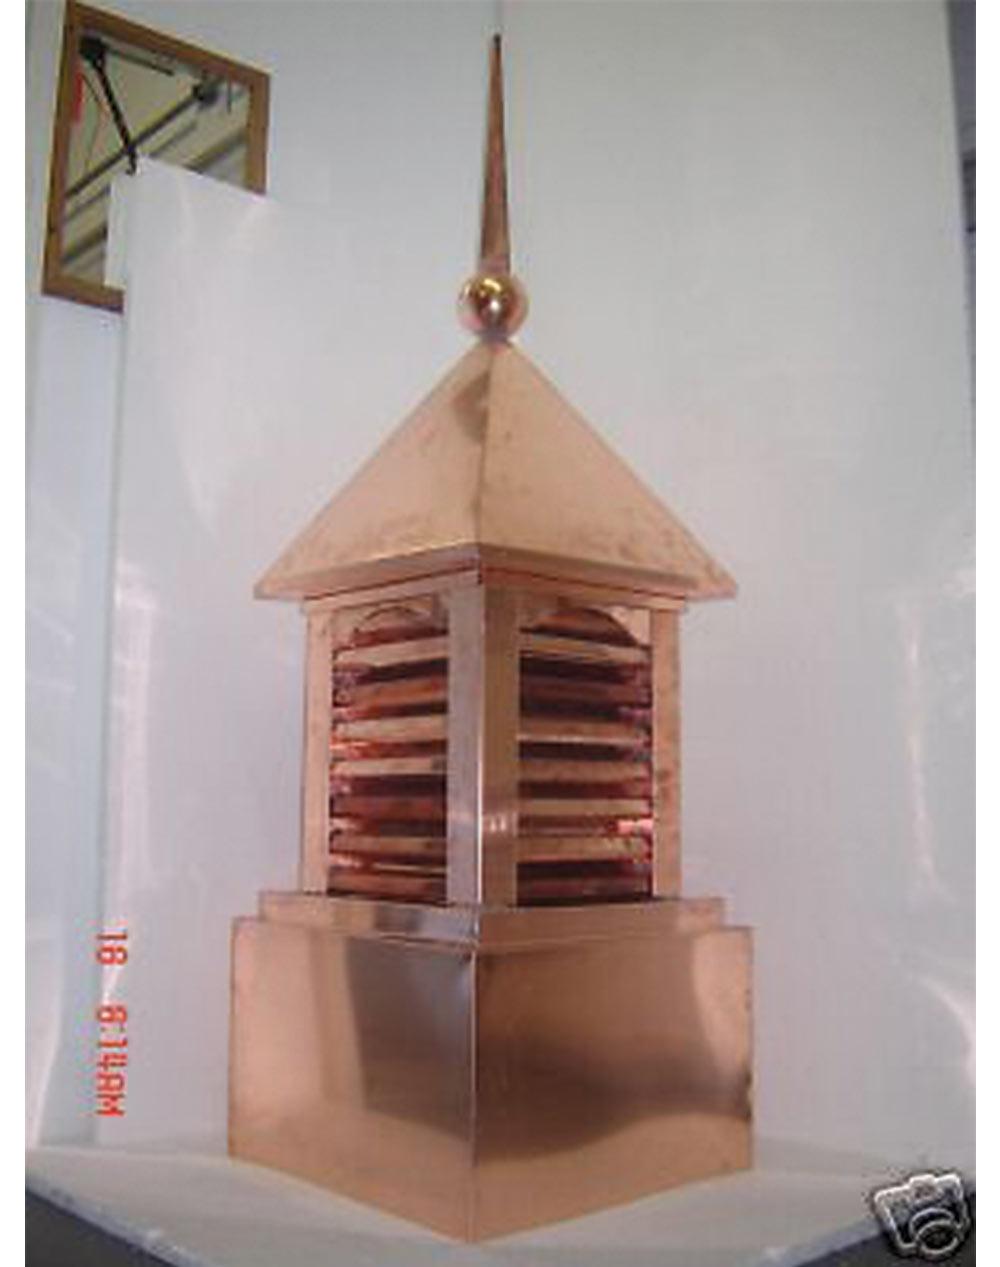 Decorative Copper Roofing Cupola Ii Home Of Copper Art